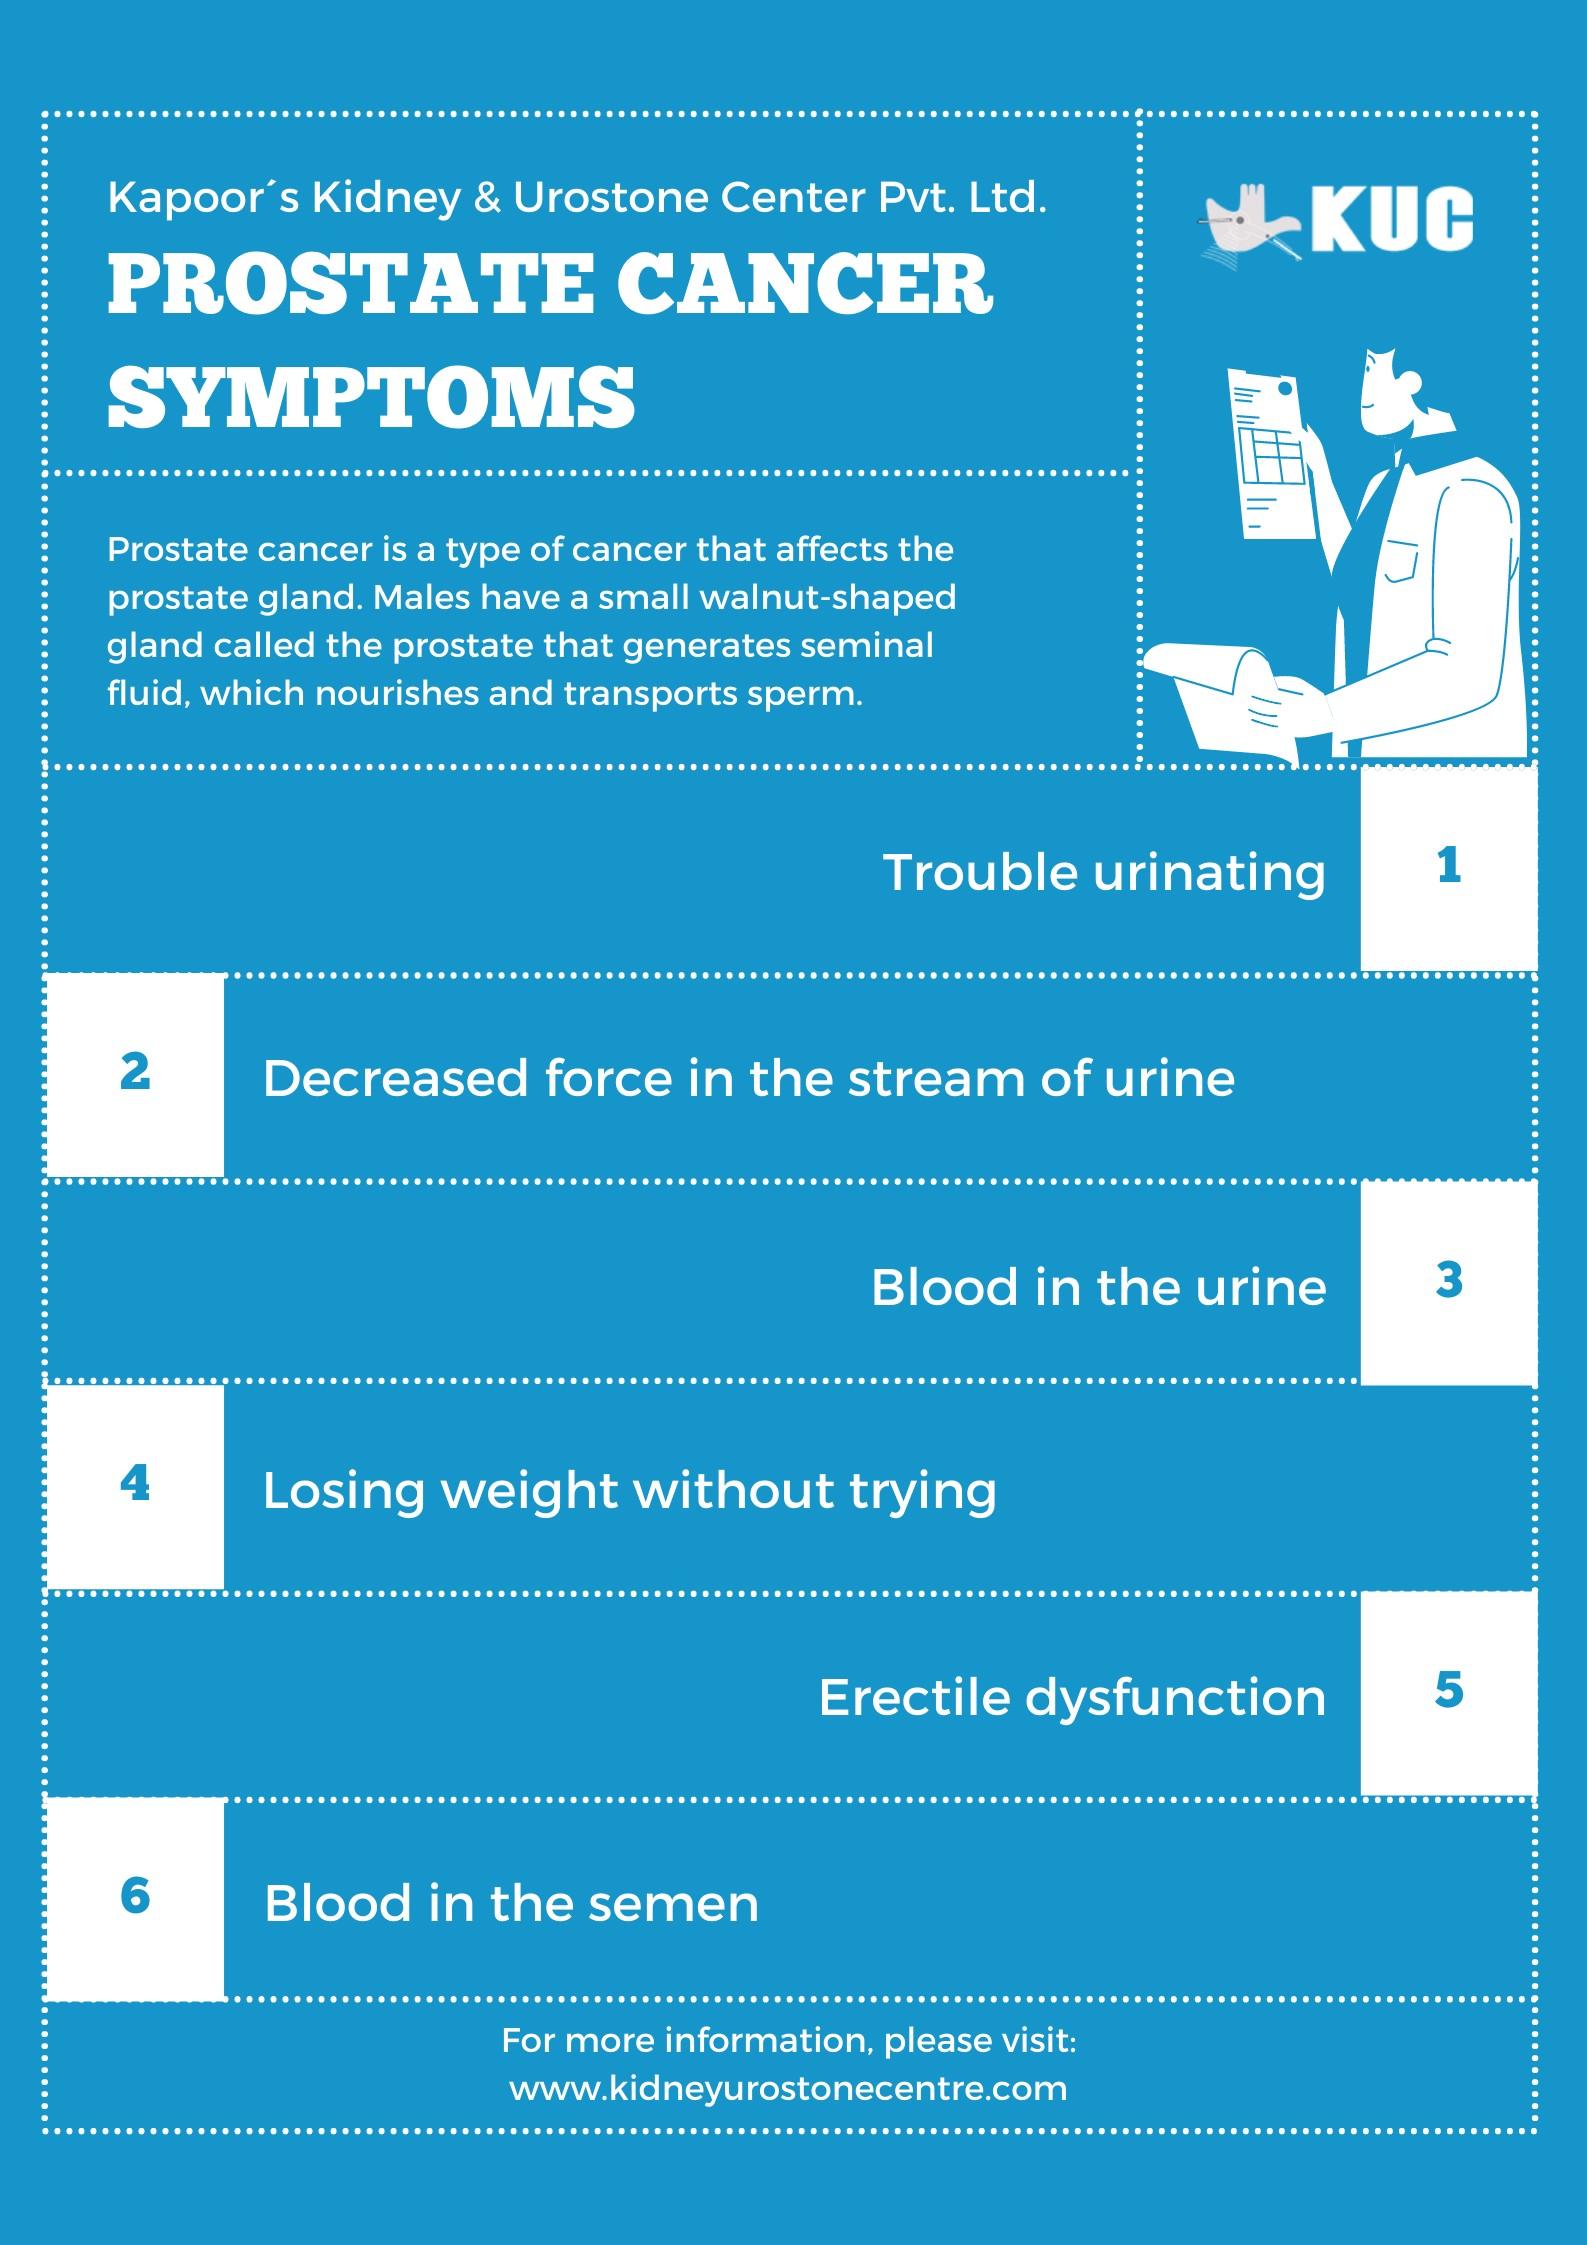 Prostate Cancer Symptoms | Kapoor´s Kidney & Urostone Center Pvt. Ltd.